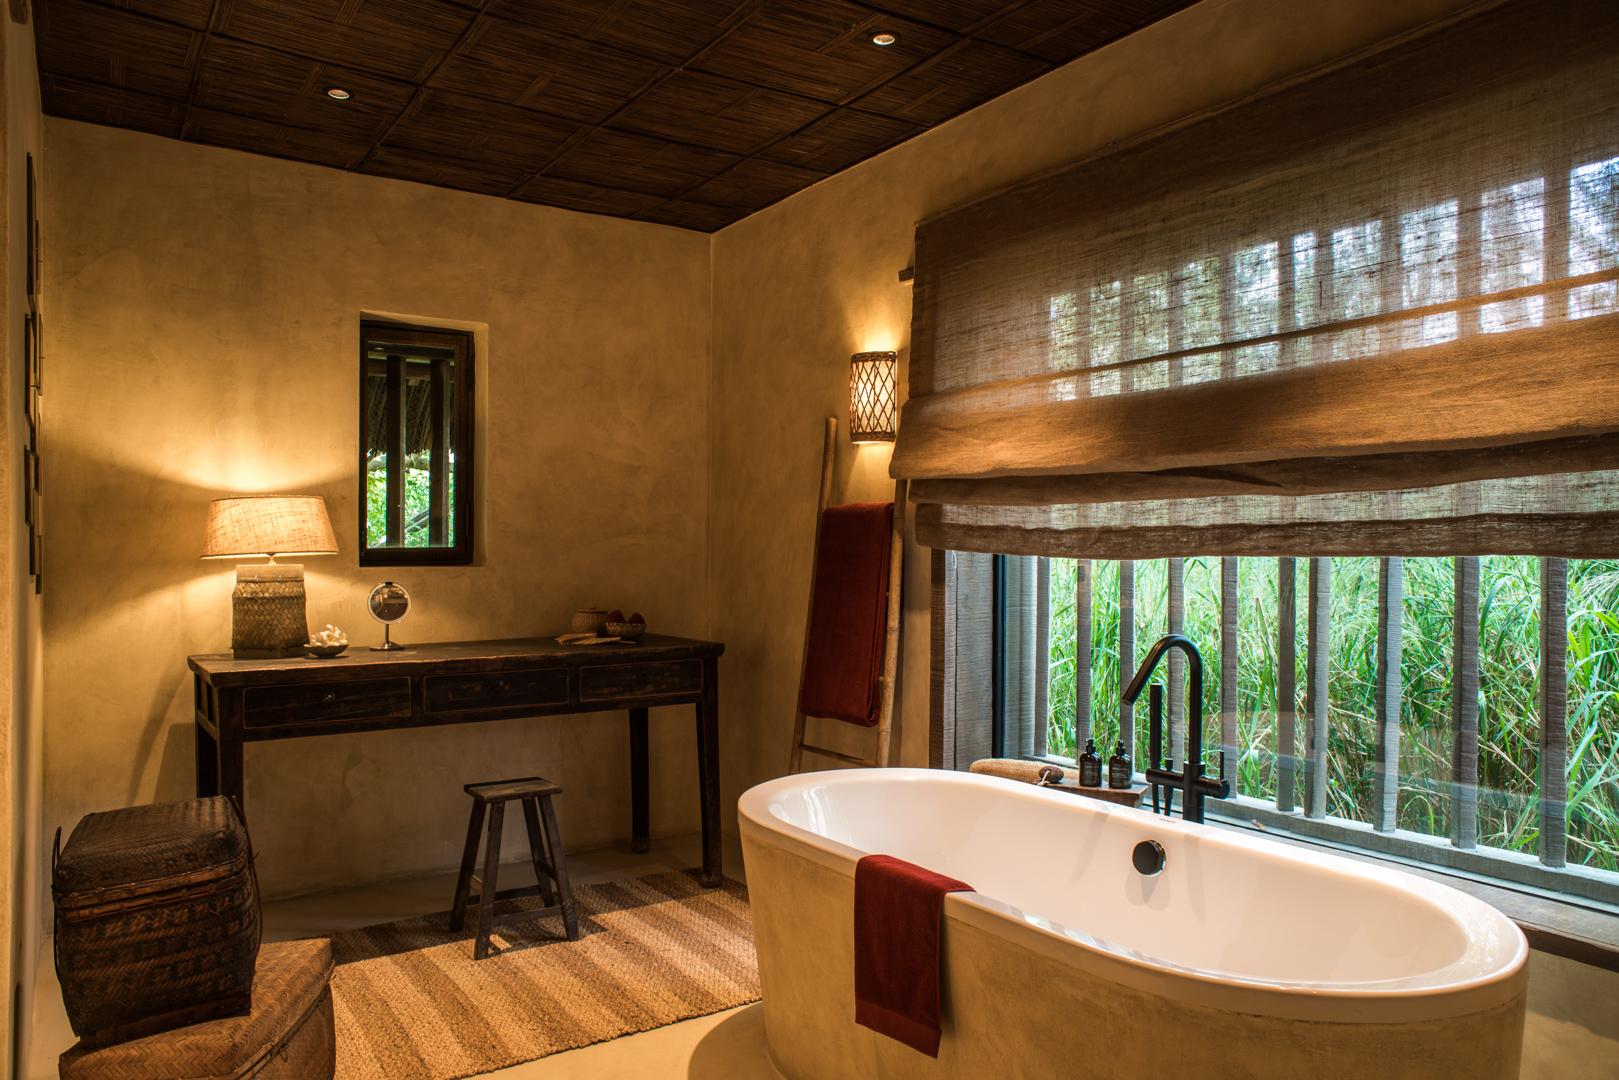 Zannier-Hotels-Bãi-San-Hô-Beach-Pool-Villa-Bathroom-1-©-Frederik-Wissink-for-Zannier-Hotels-1